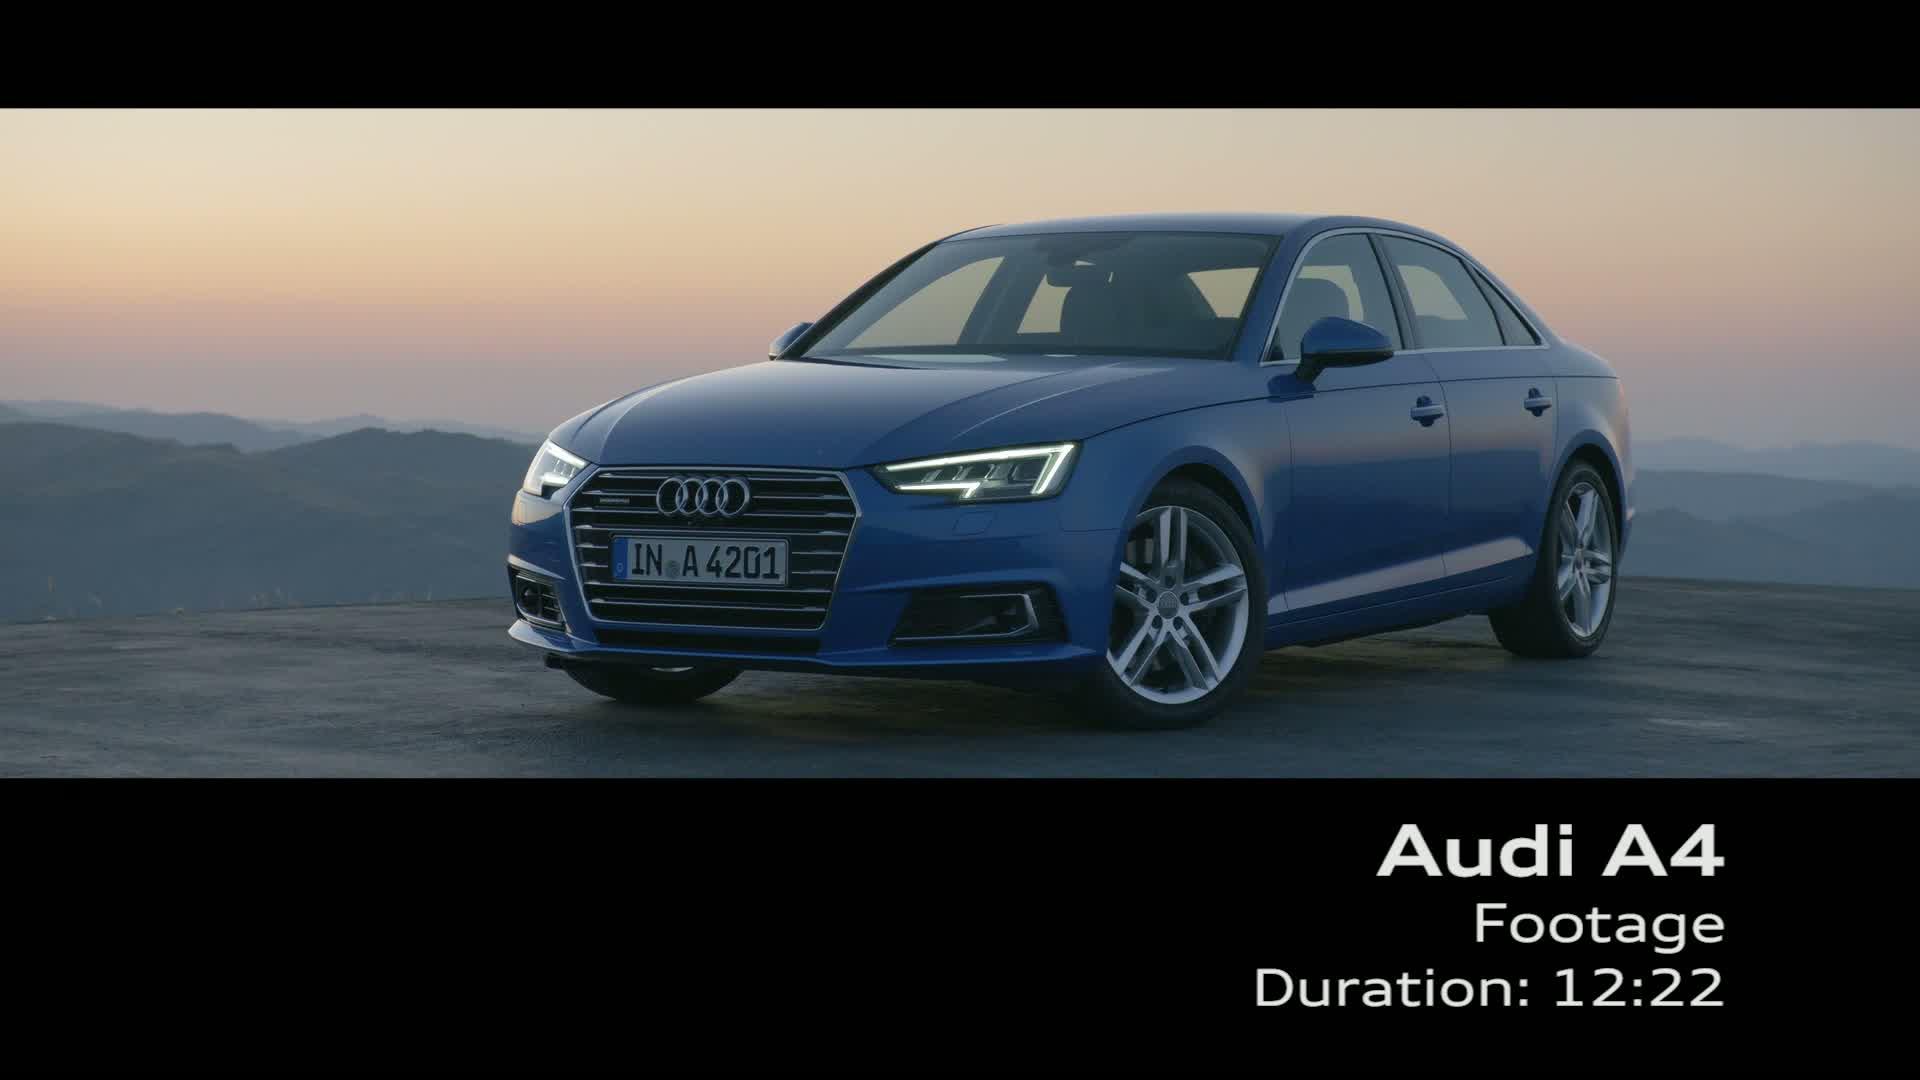 Die neue Audi A4 Limousine - Footage